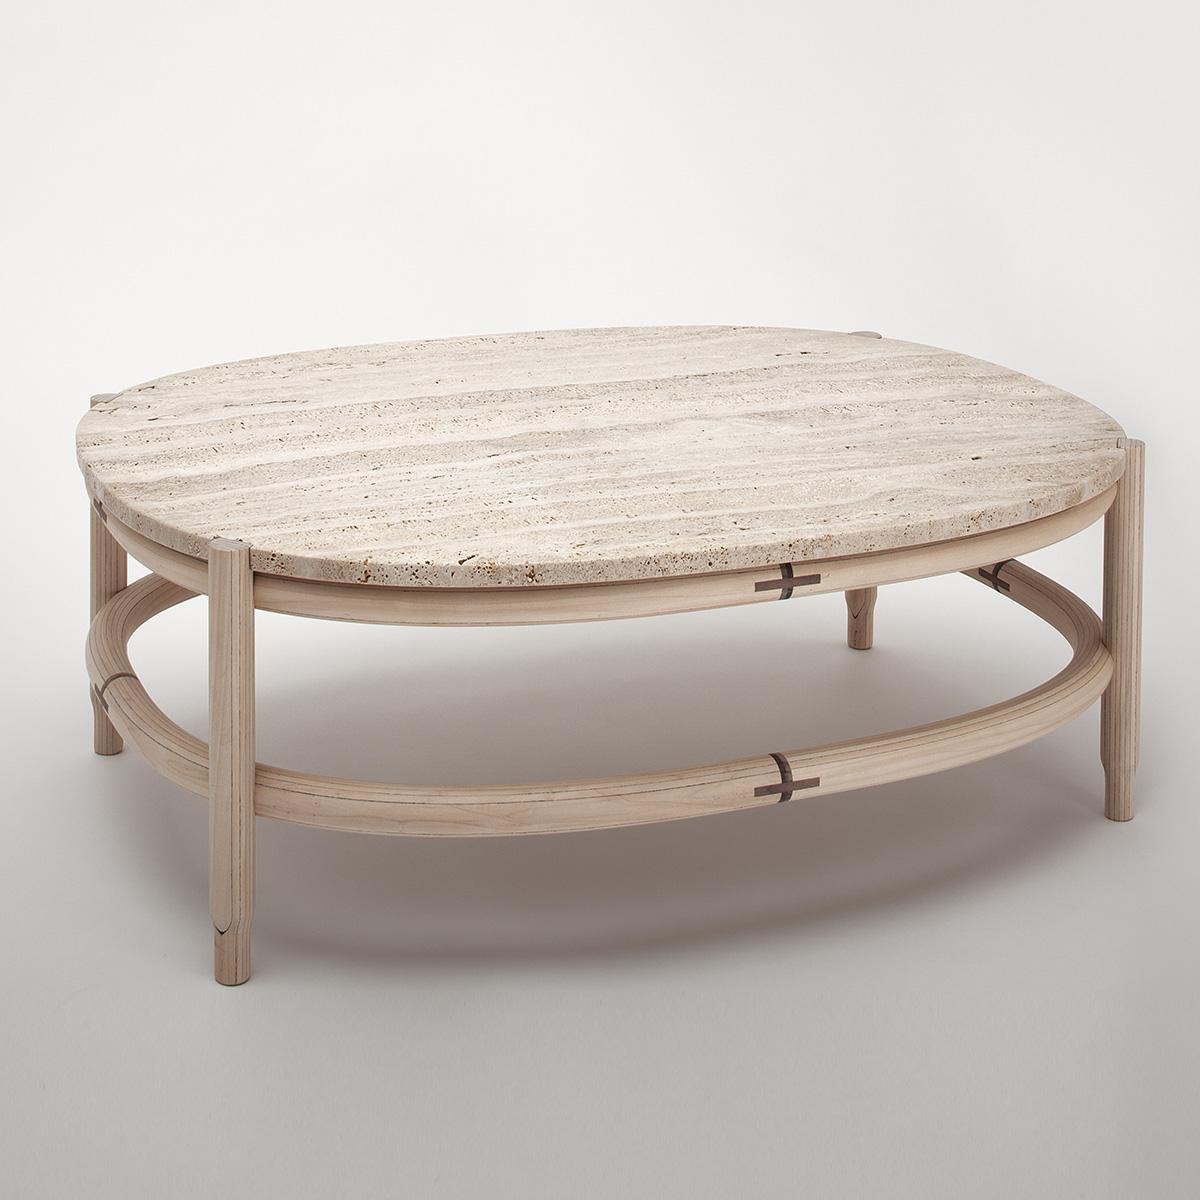 EO_SO_Table_01_photo_by_Alberto_Strada.jpg